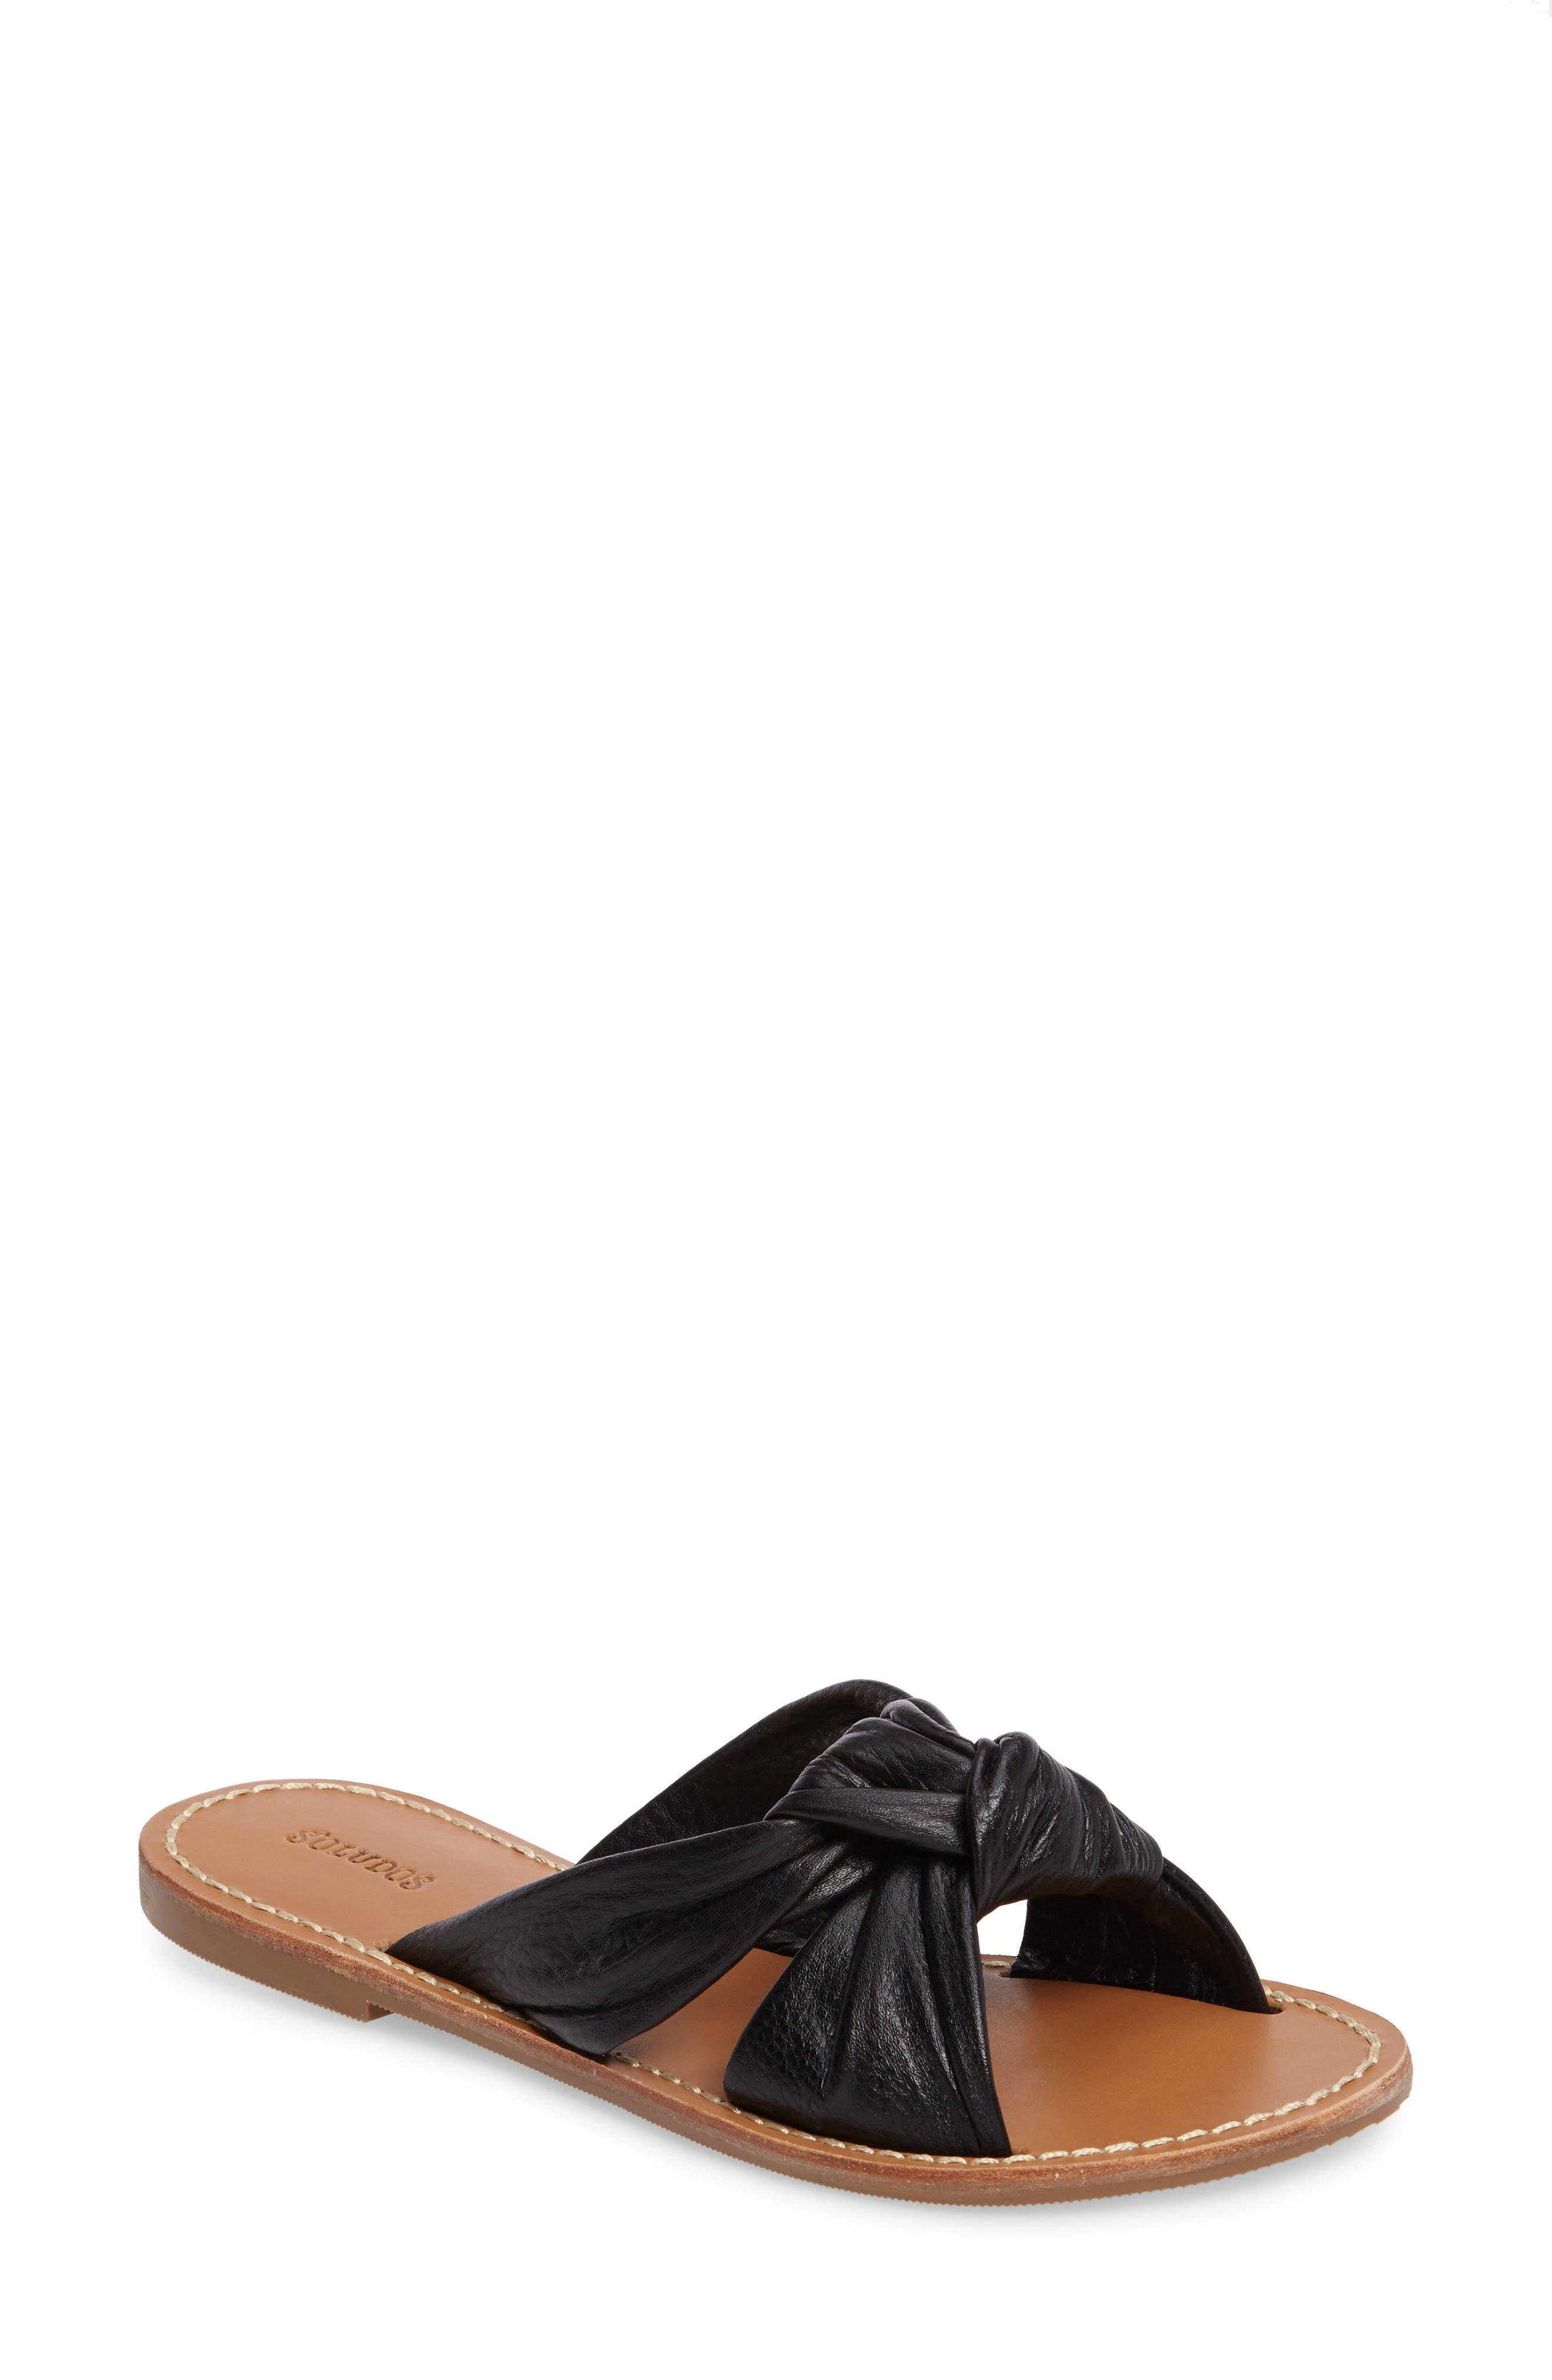 Alternate Image 1 Selected - Soludos Knotted Slide Sandal (Women)